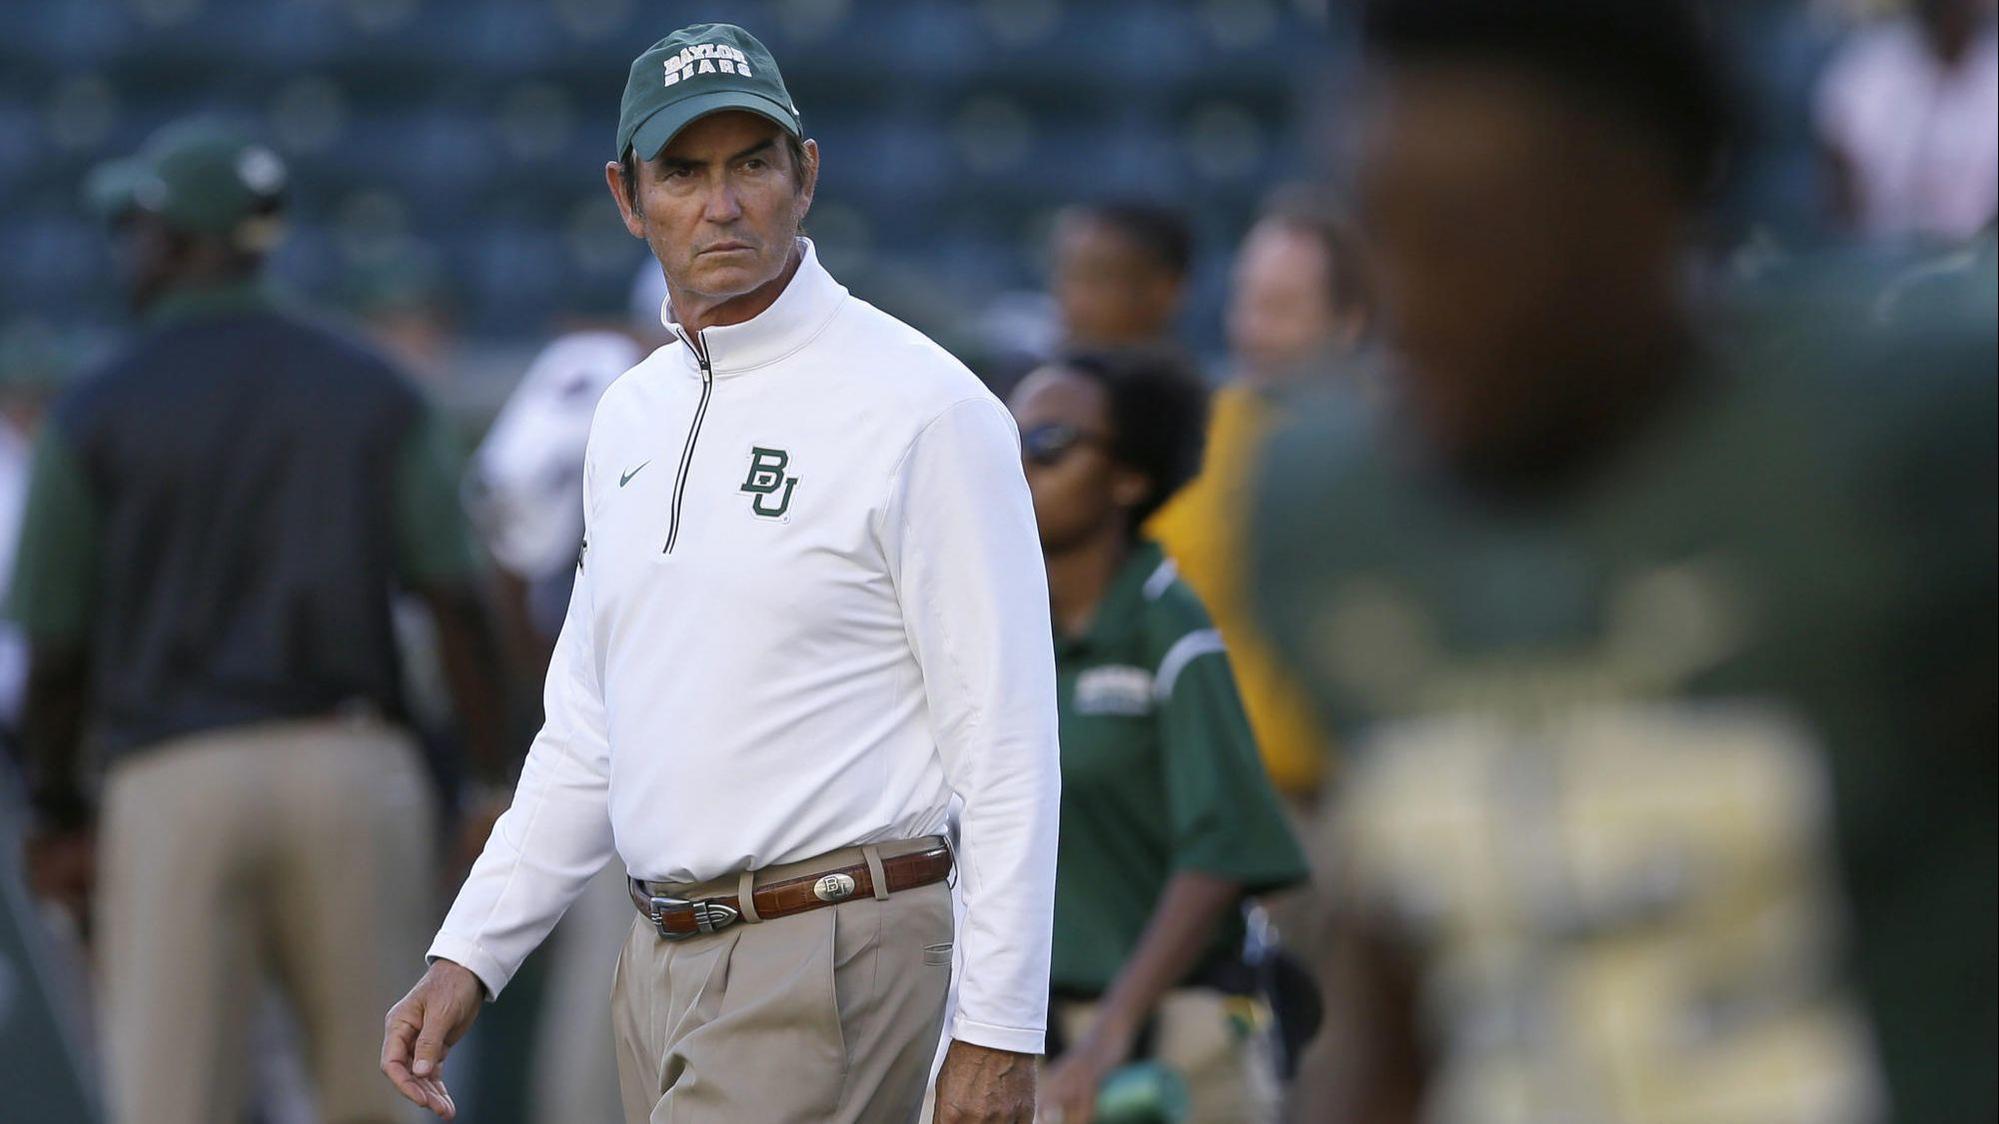 Texas high school hires former Baylor football coach Art Briles